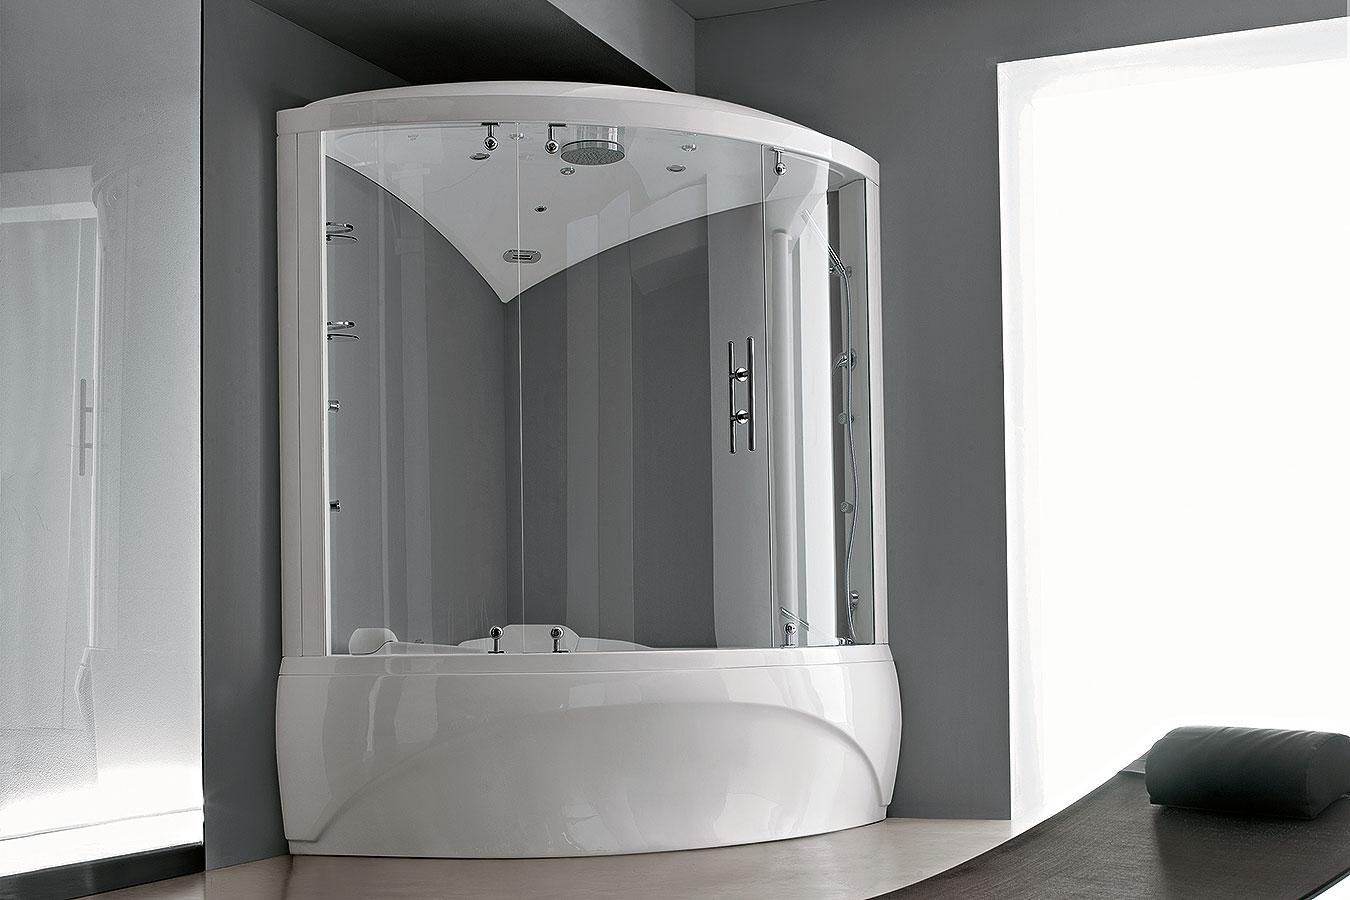 Vasca Da Bagno Teuco Armonya : Vasca teuco armonya teuco paper vasca normale senza pannelli